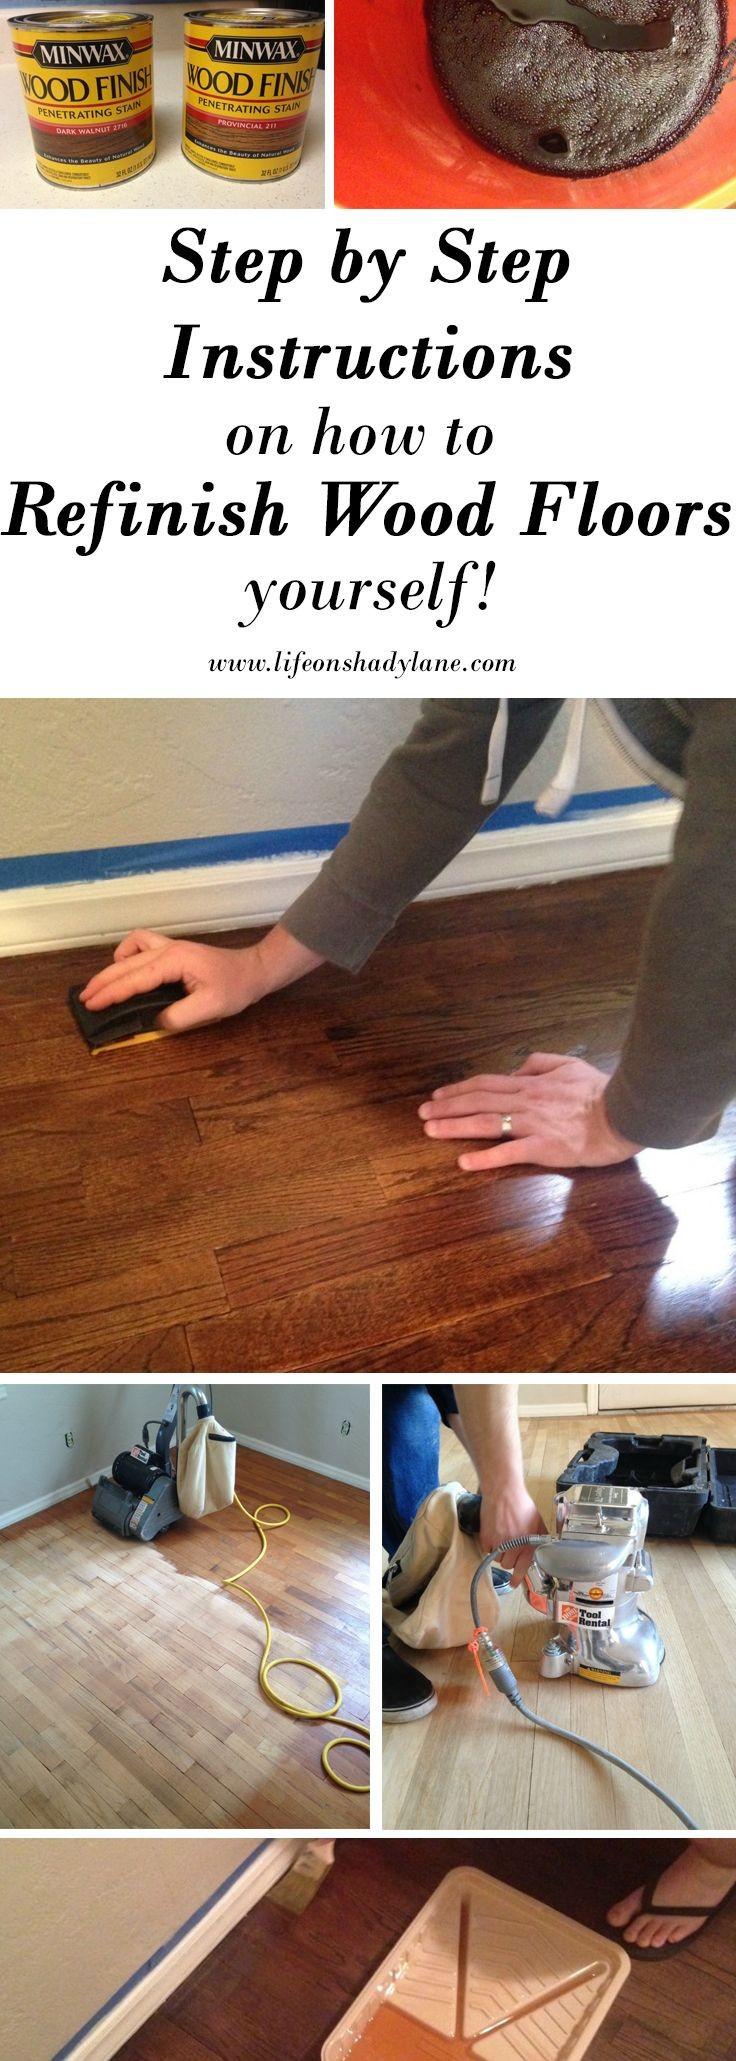 bruce solid oak hardwood flooring reviews of 13 fresh hardwood floor repair kit pics dizpos com with regard to hardwood floor repair kit fresh how to refinish hardwood floors part 1 pics of 13 fresh